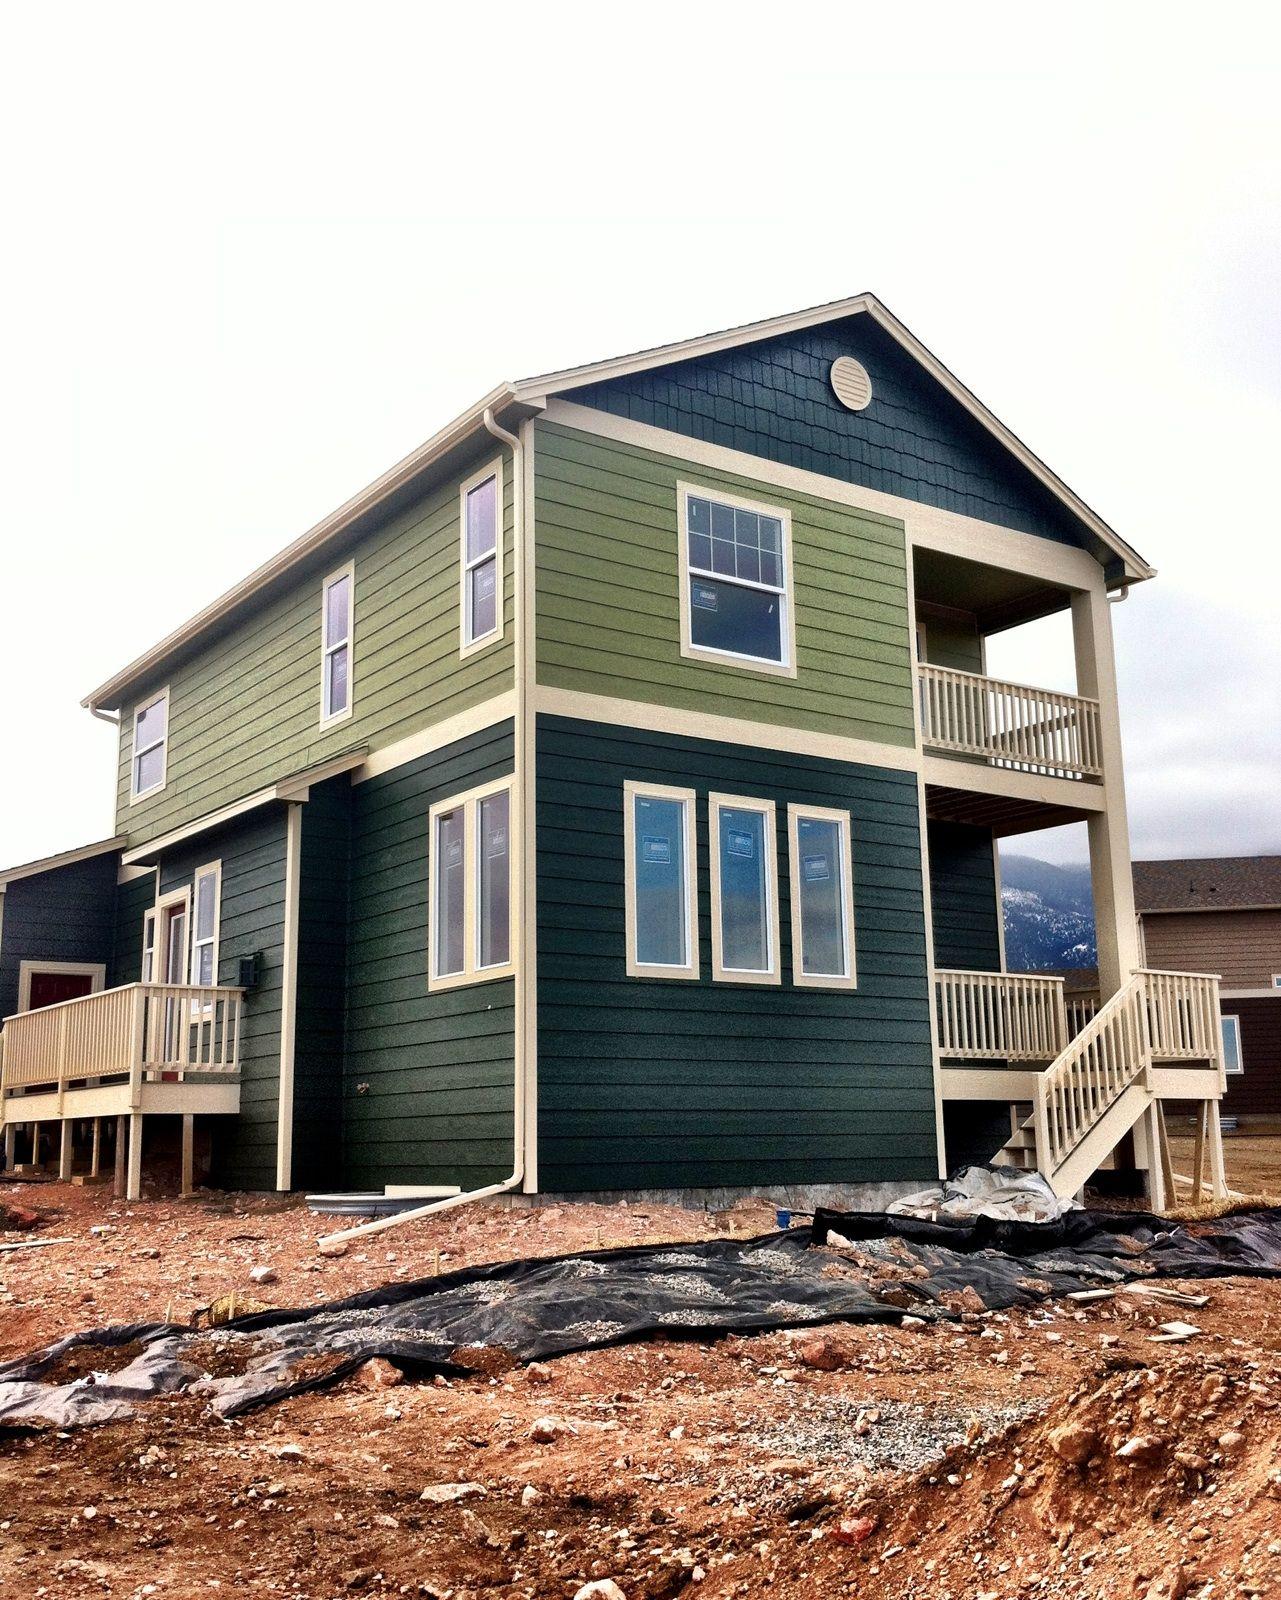 University Oaks SOLD! Home builders